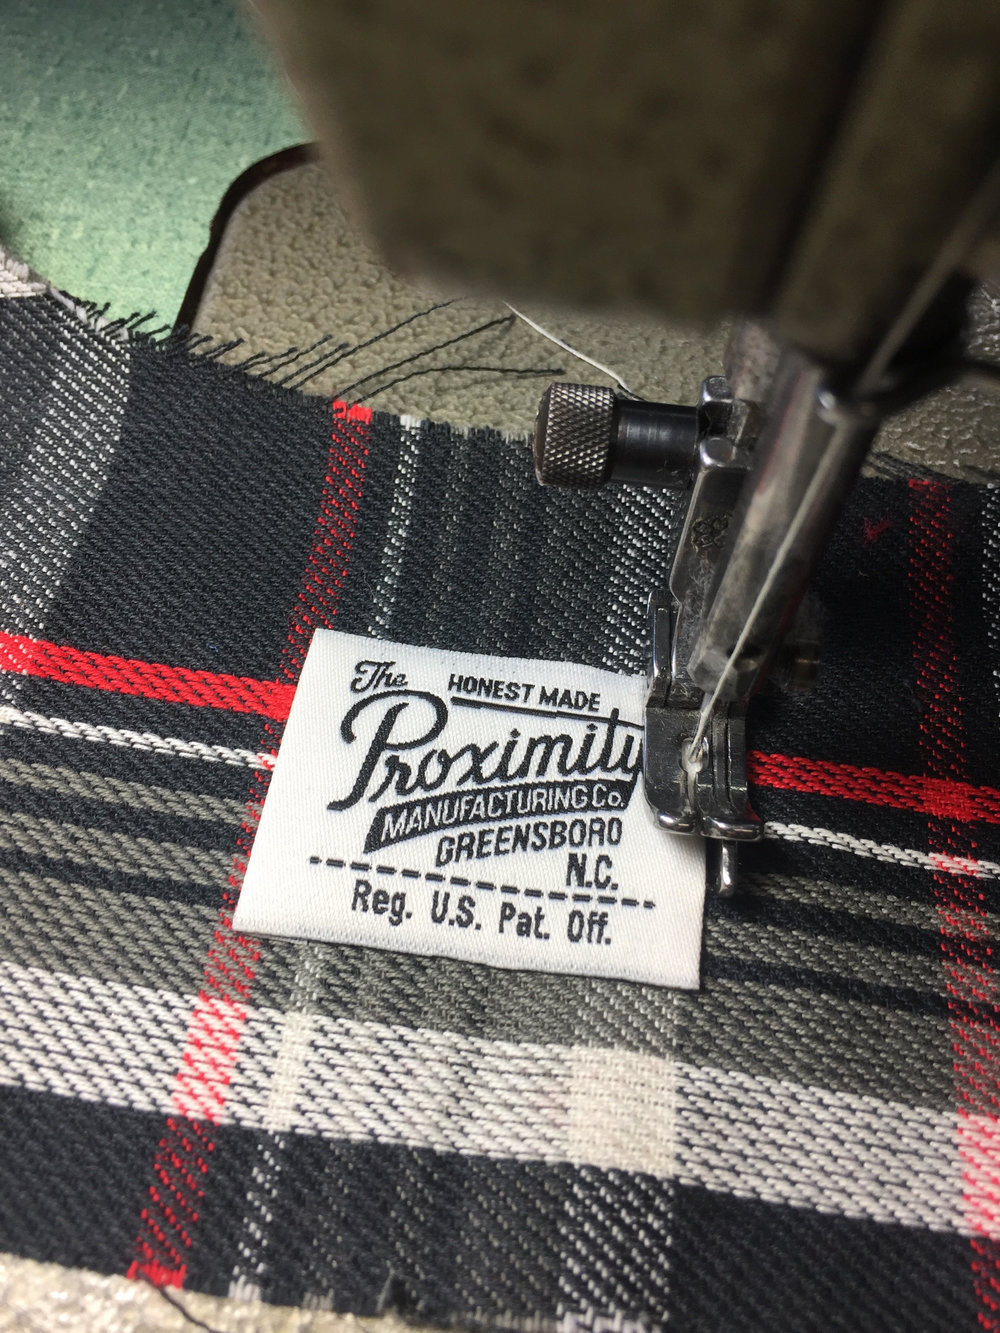 sewn label.jpg